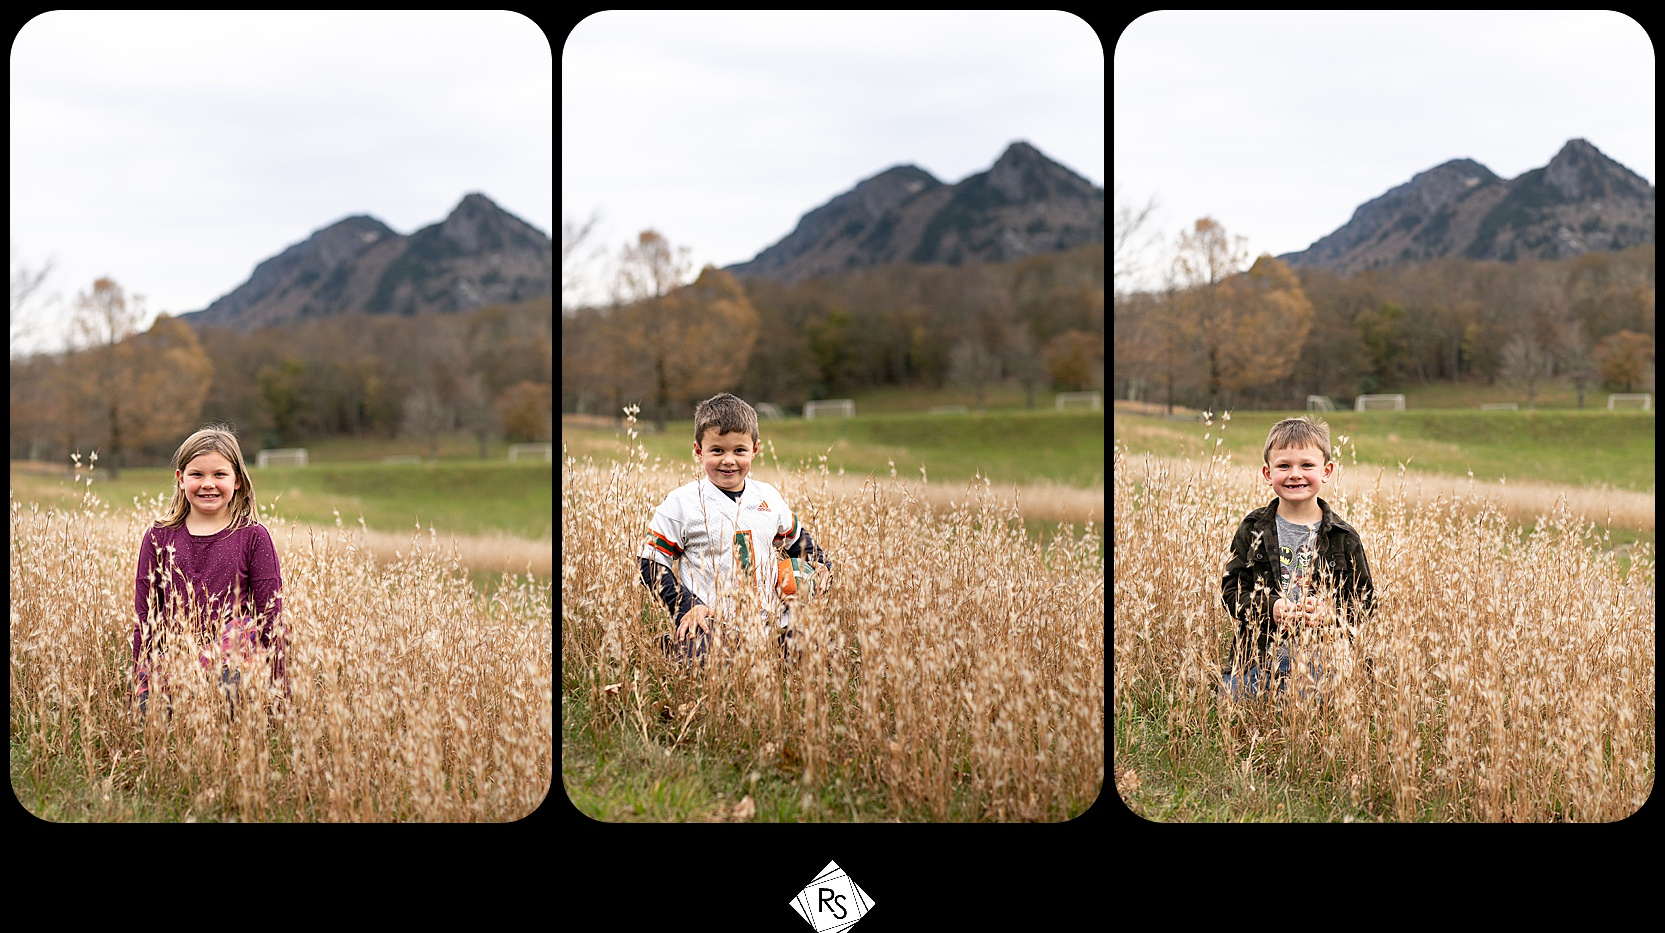 #rodneysmithfamilies,#rodneysmithphotography,Linville,McRae Meadows,North Carolina,Rodney Smith Photography,westernnc,